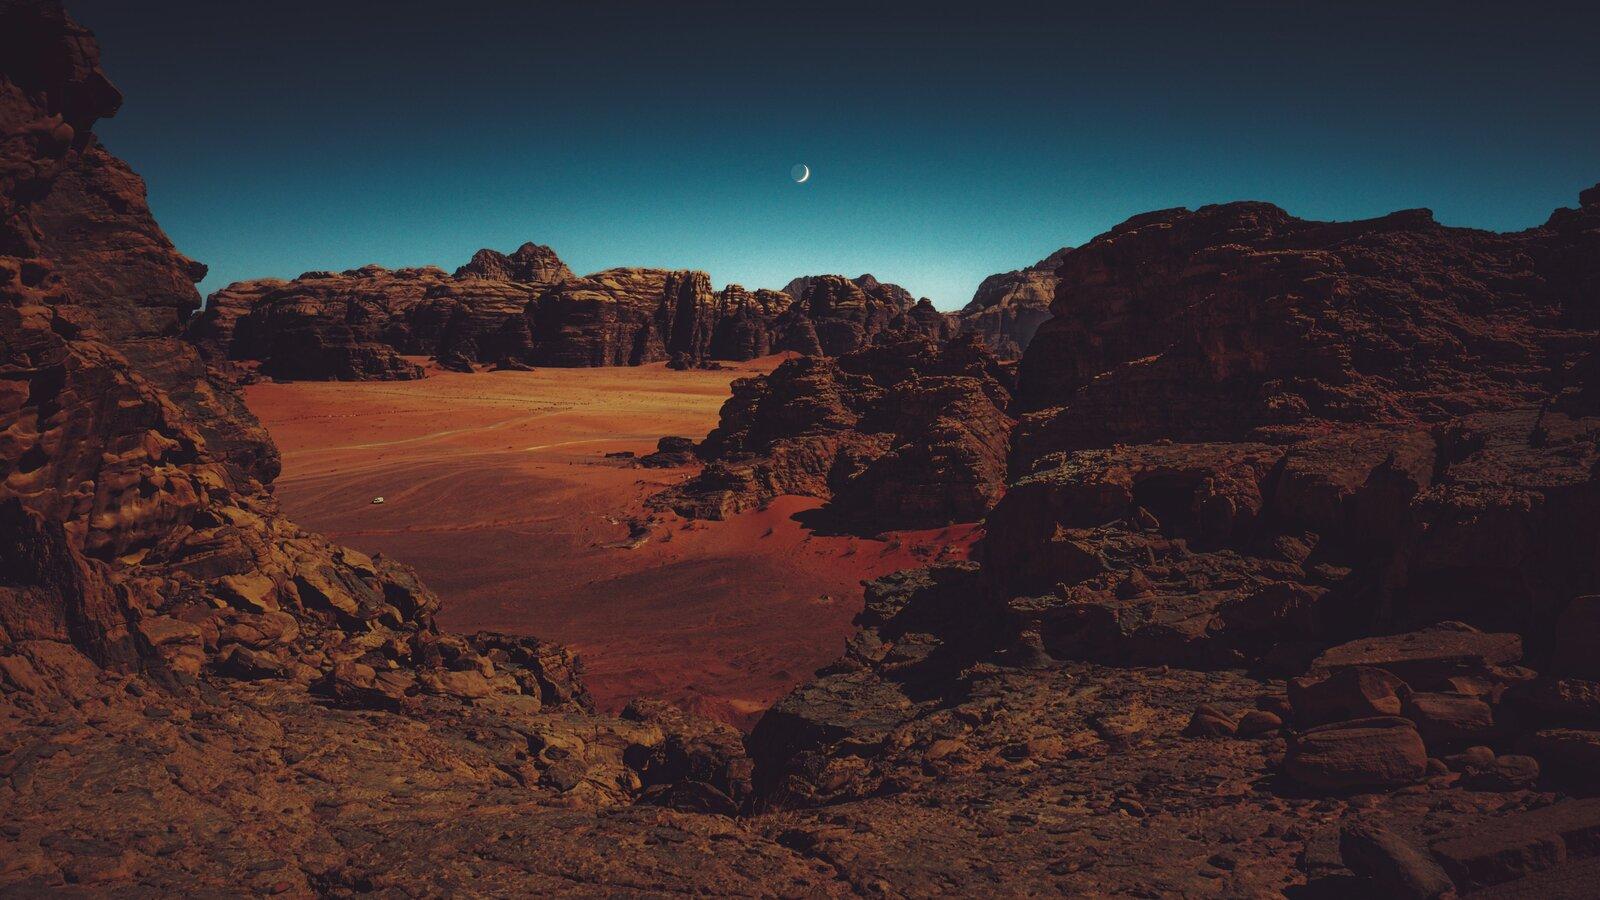 late-evening-night-moon-4k-6t.jpg